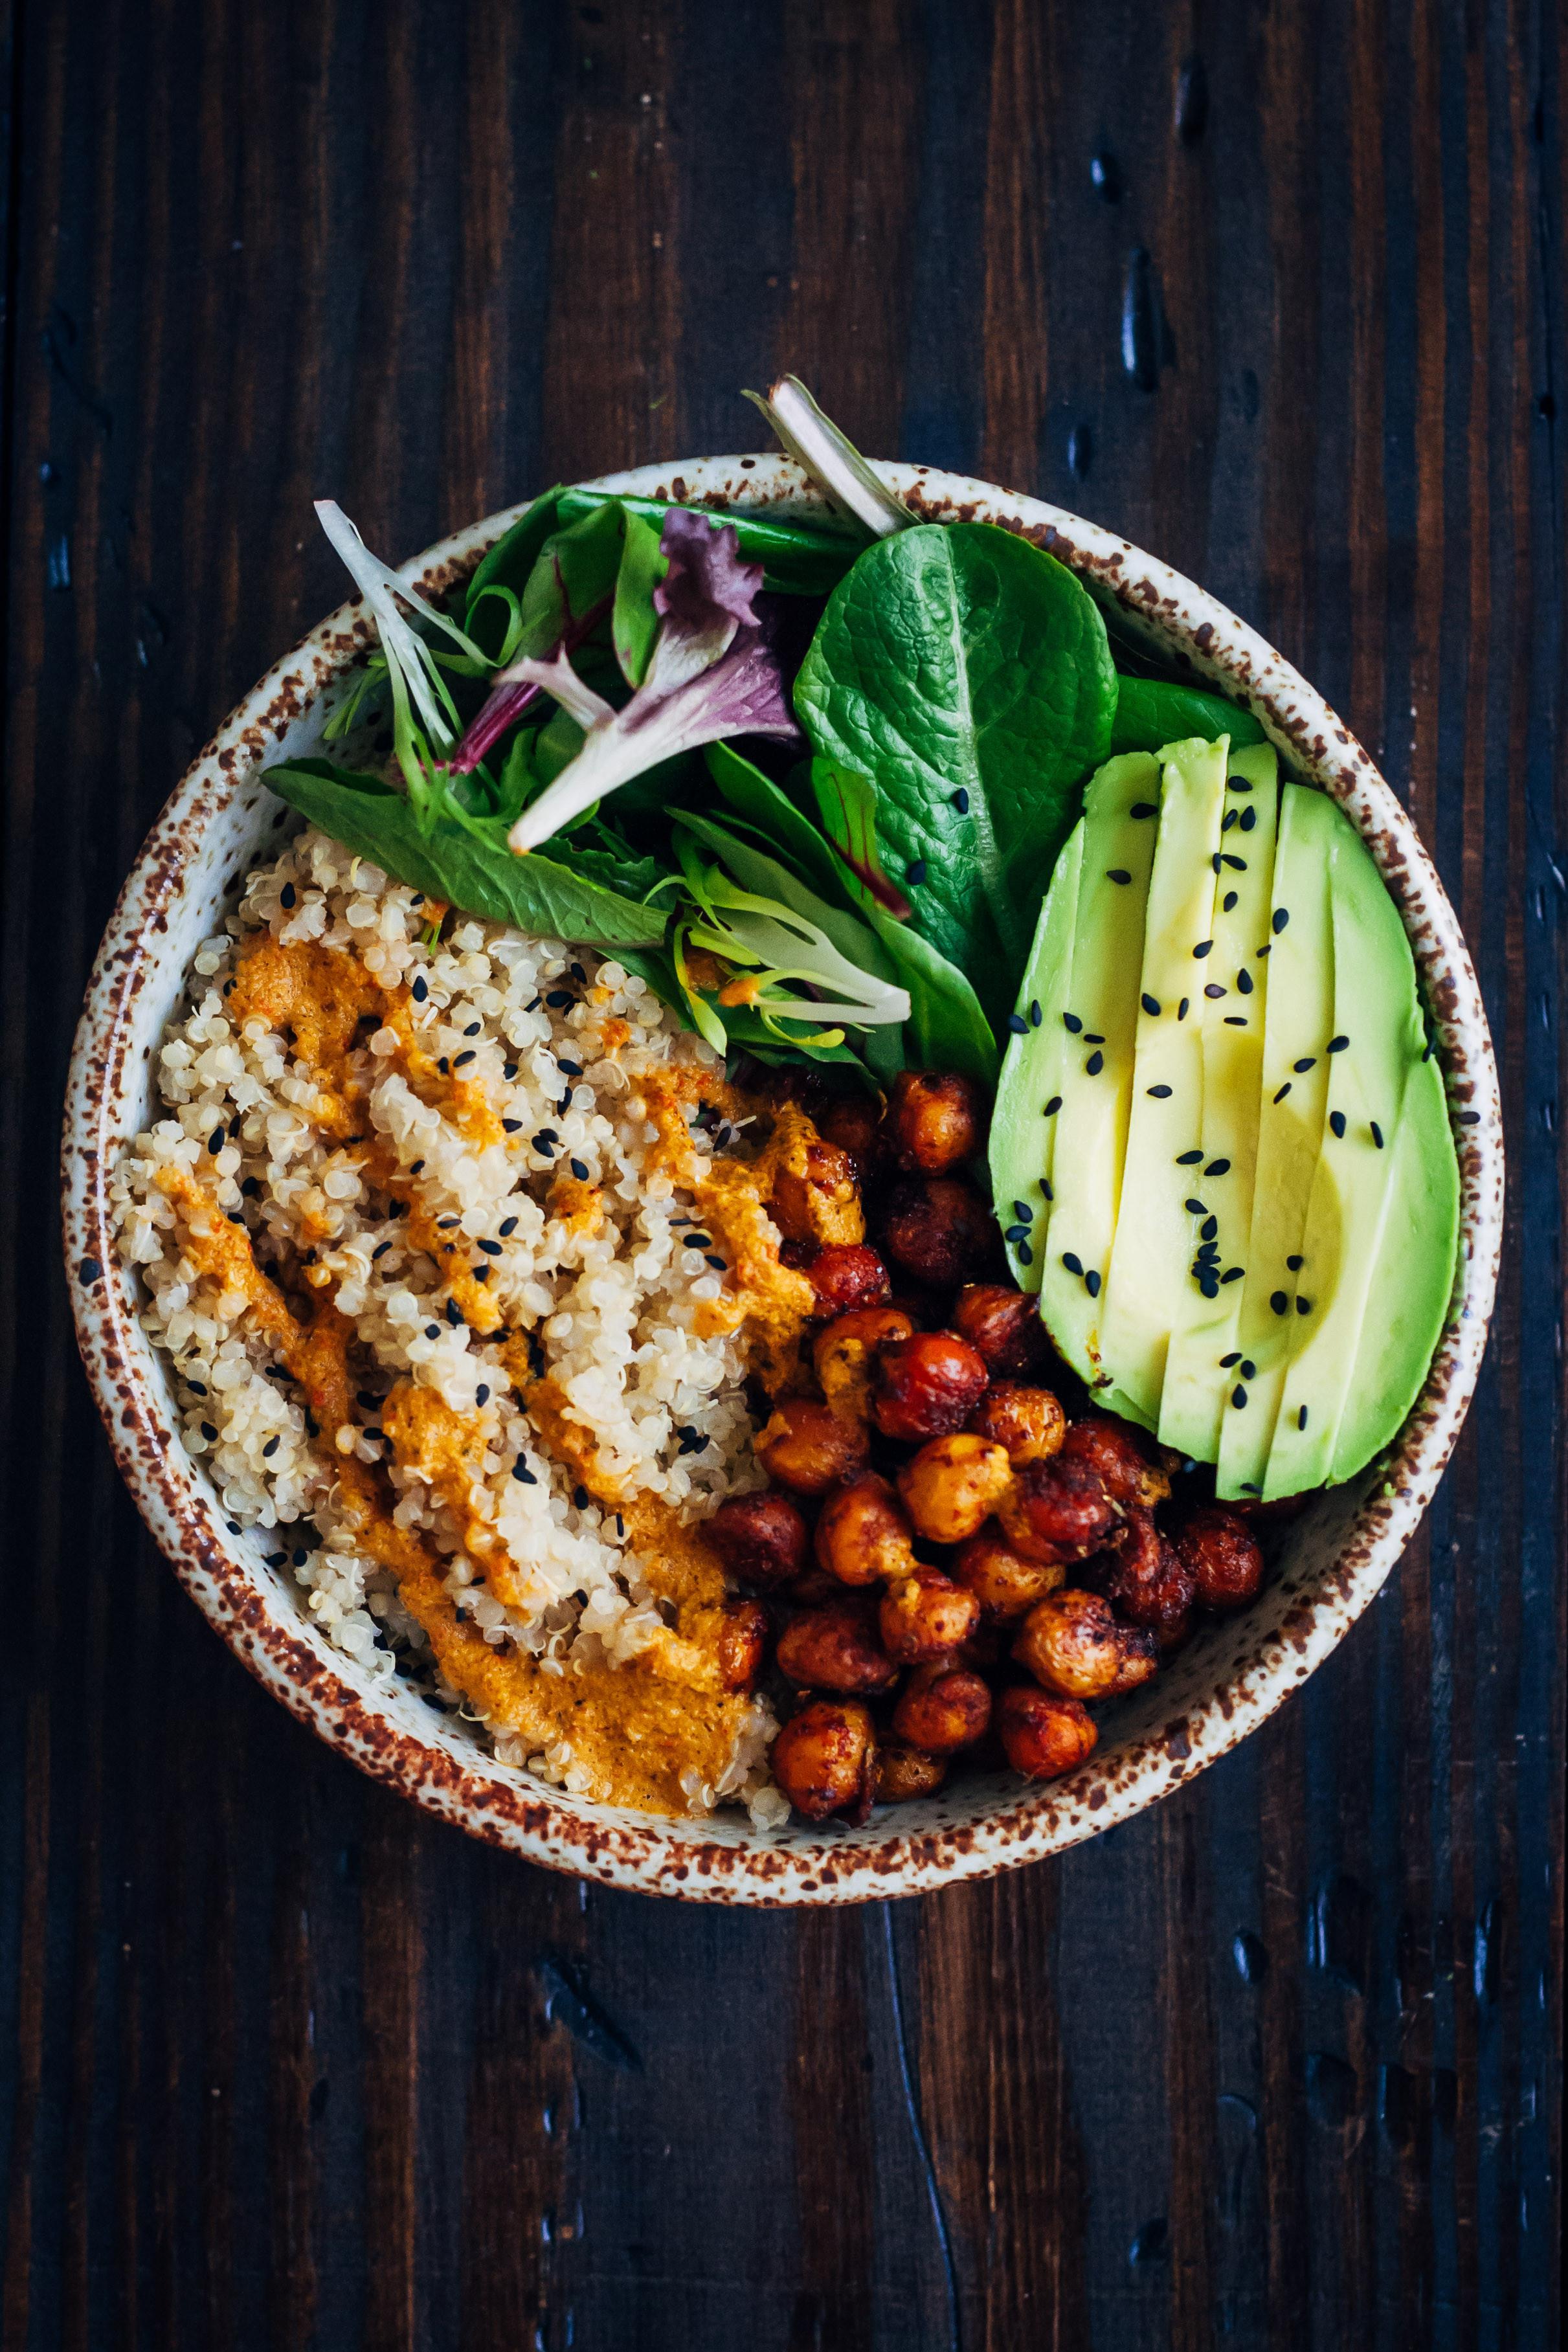 Best Vegetarian Dinner Recipes  The Vegan Buddha Bowl